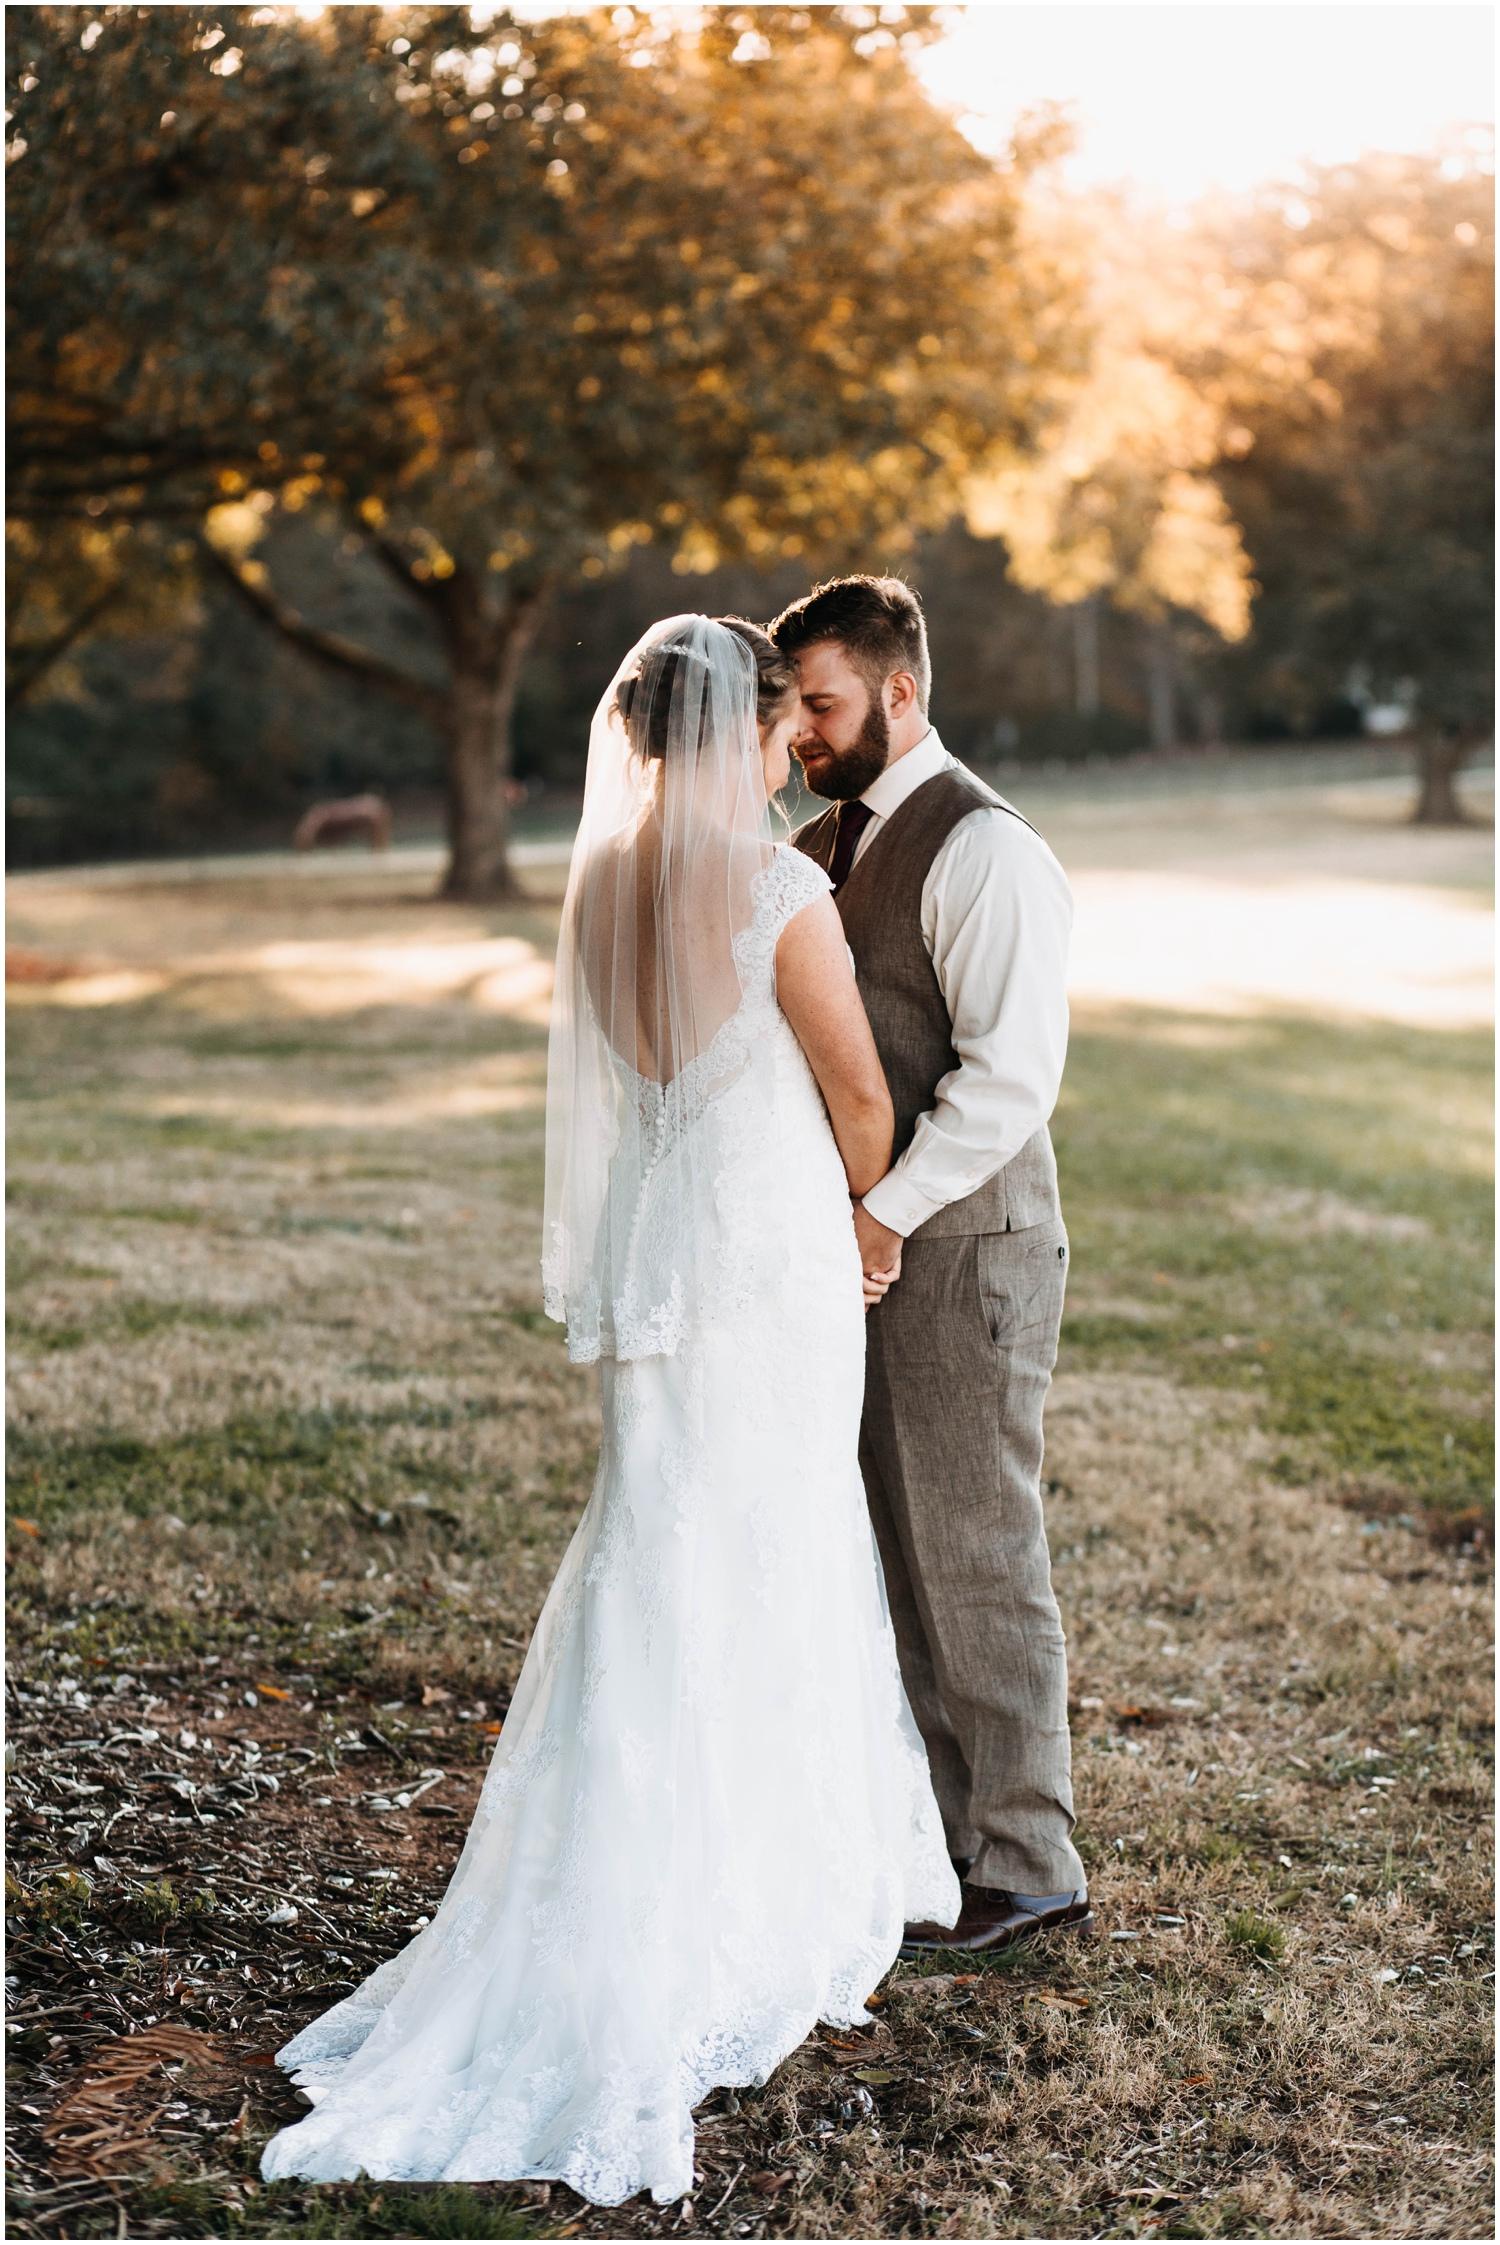 Jess+Dan_rustic_southern_farm_fall_wedding_charlotte_north carolina_taylor powers_0188.jpg